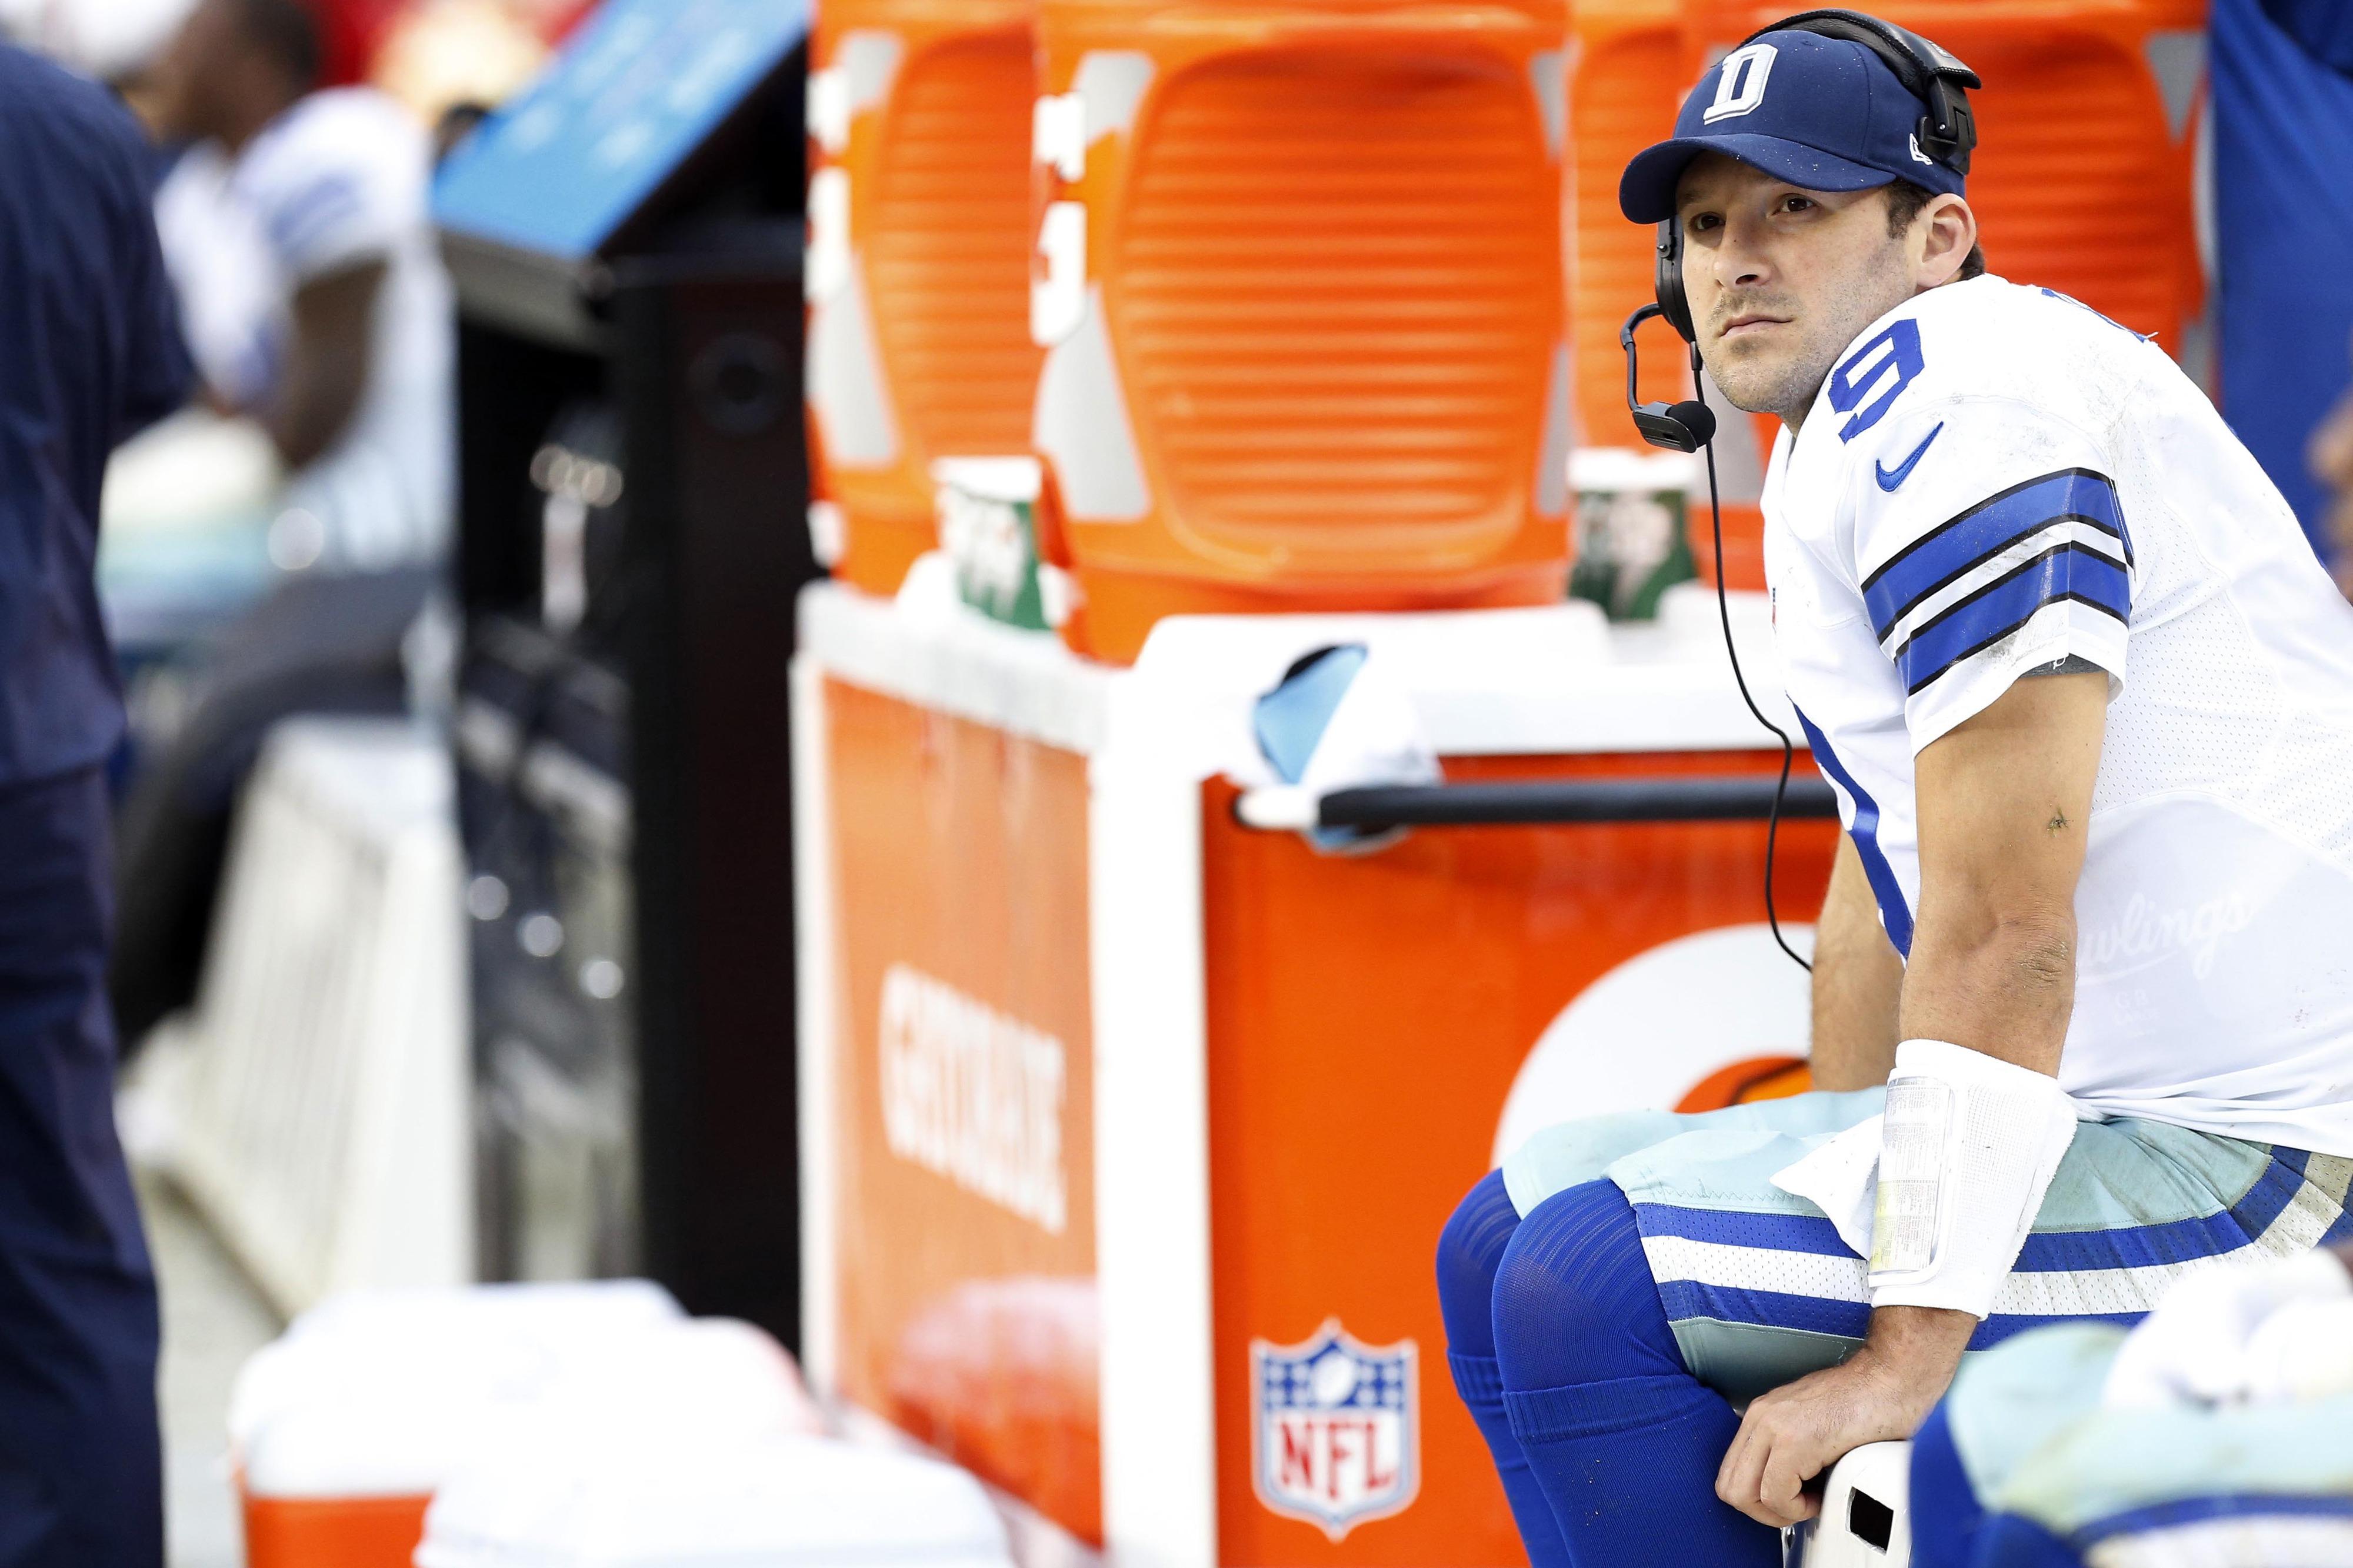 Tony Romo injury: Cowboys quarterback out for the season, per report